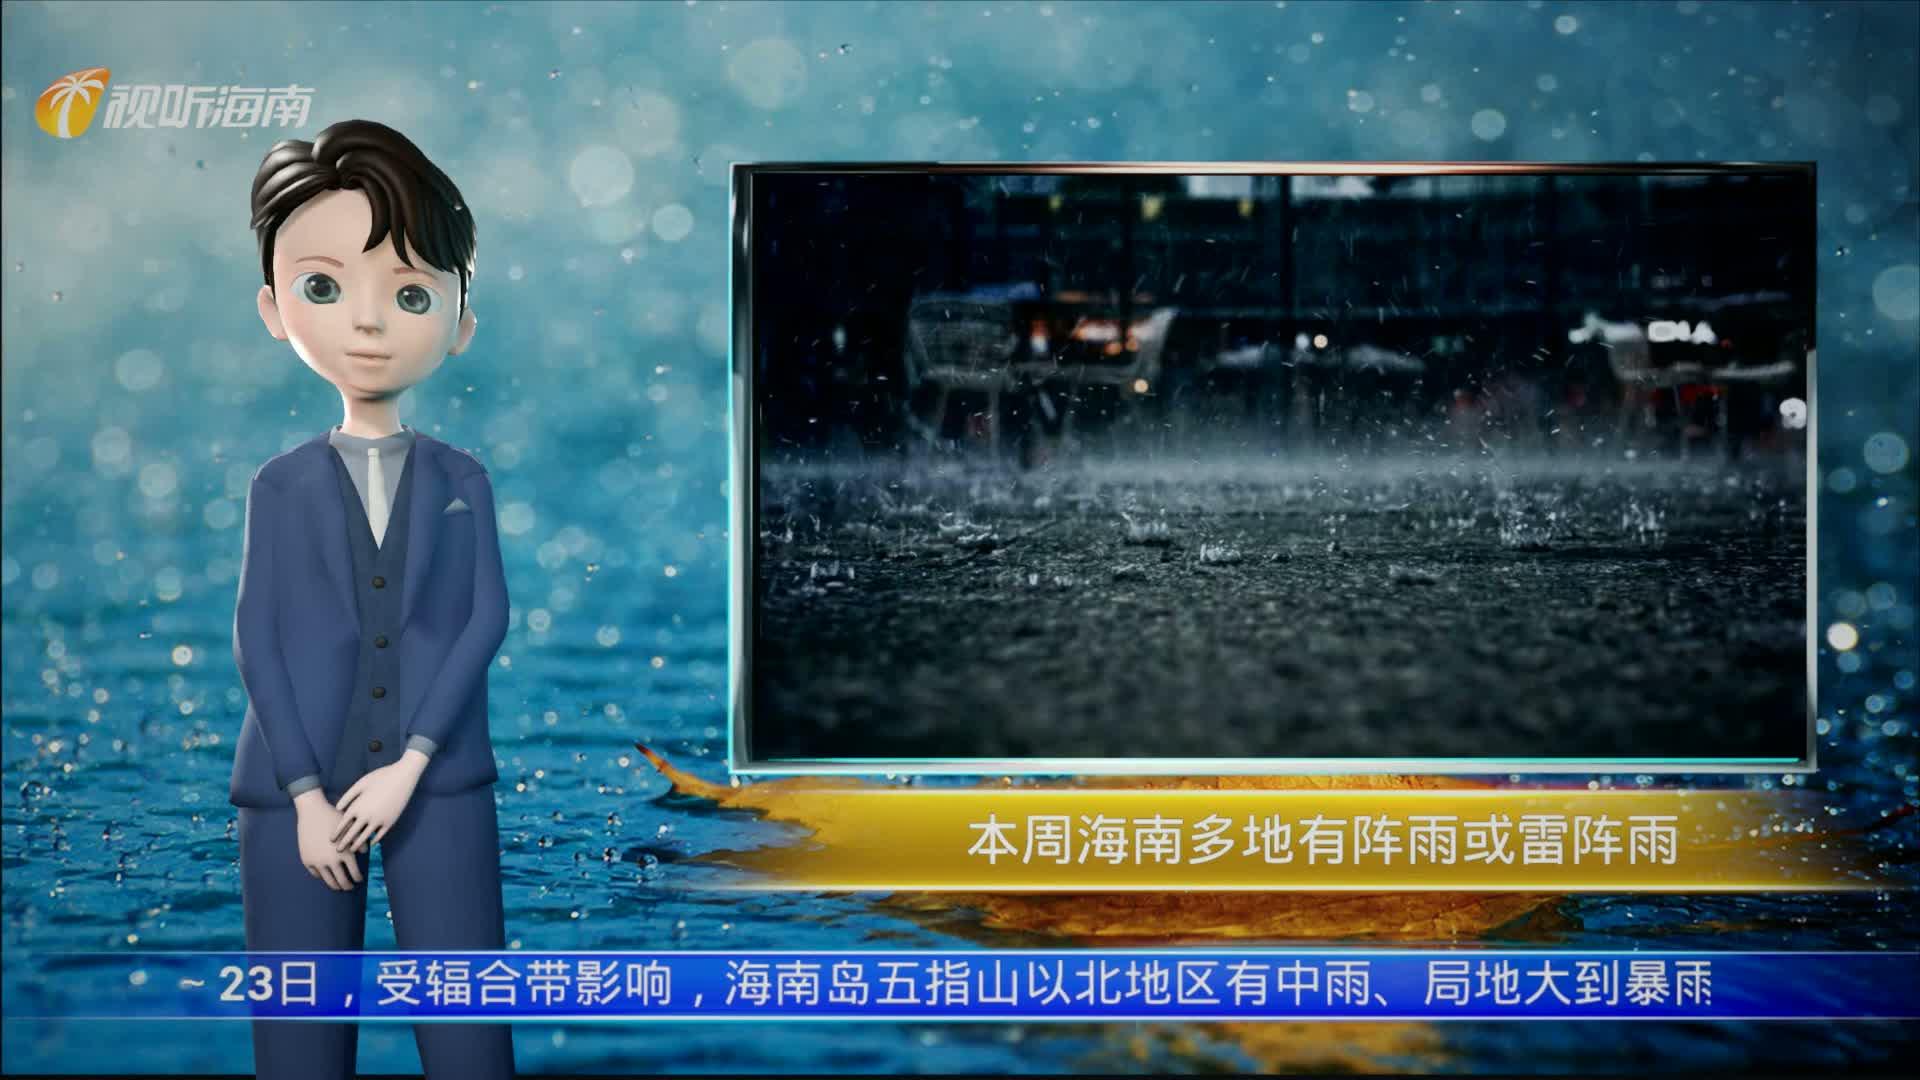 AI播報|一大波雨在路上!本周海南多地有陣雨或雷陣雨